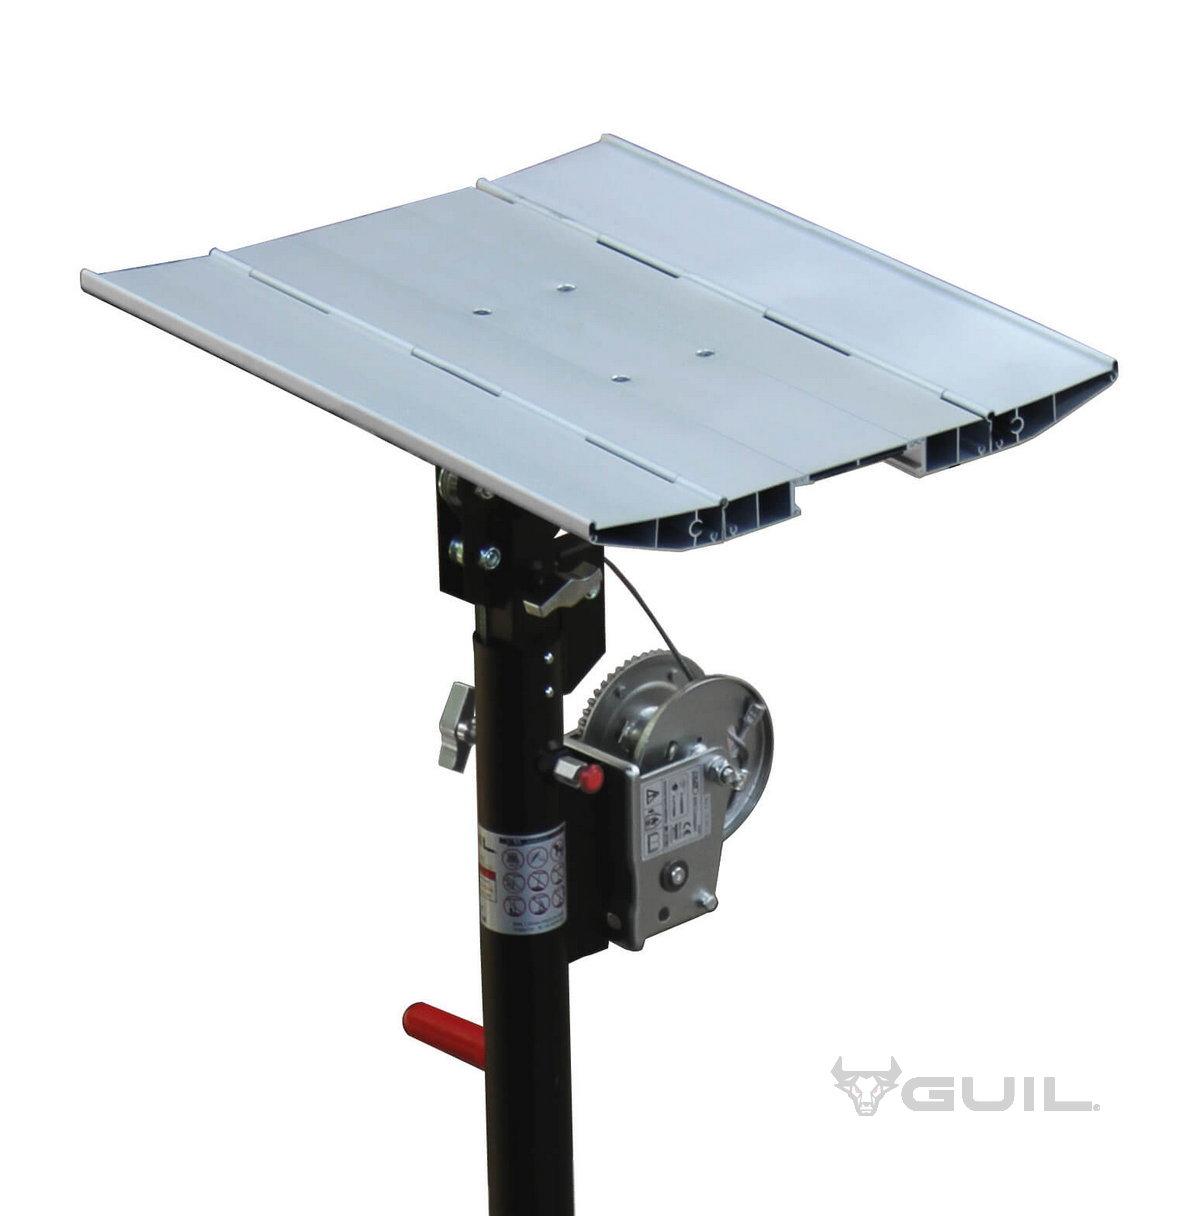 Platform aluminium (450x435) ELC-720,730,750,760 (dutch) (1)